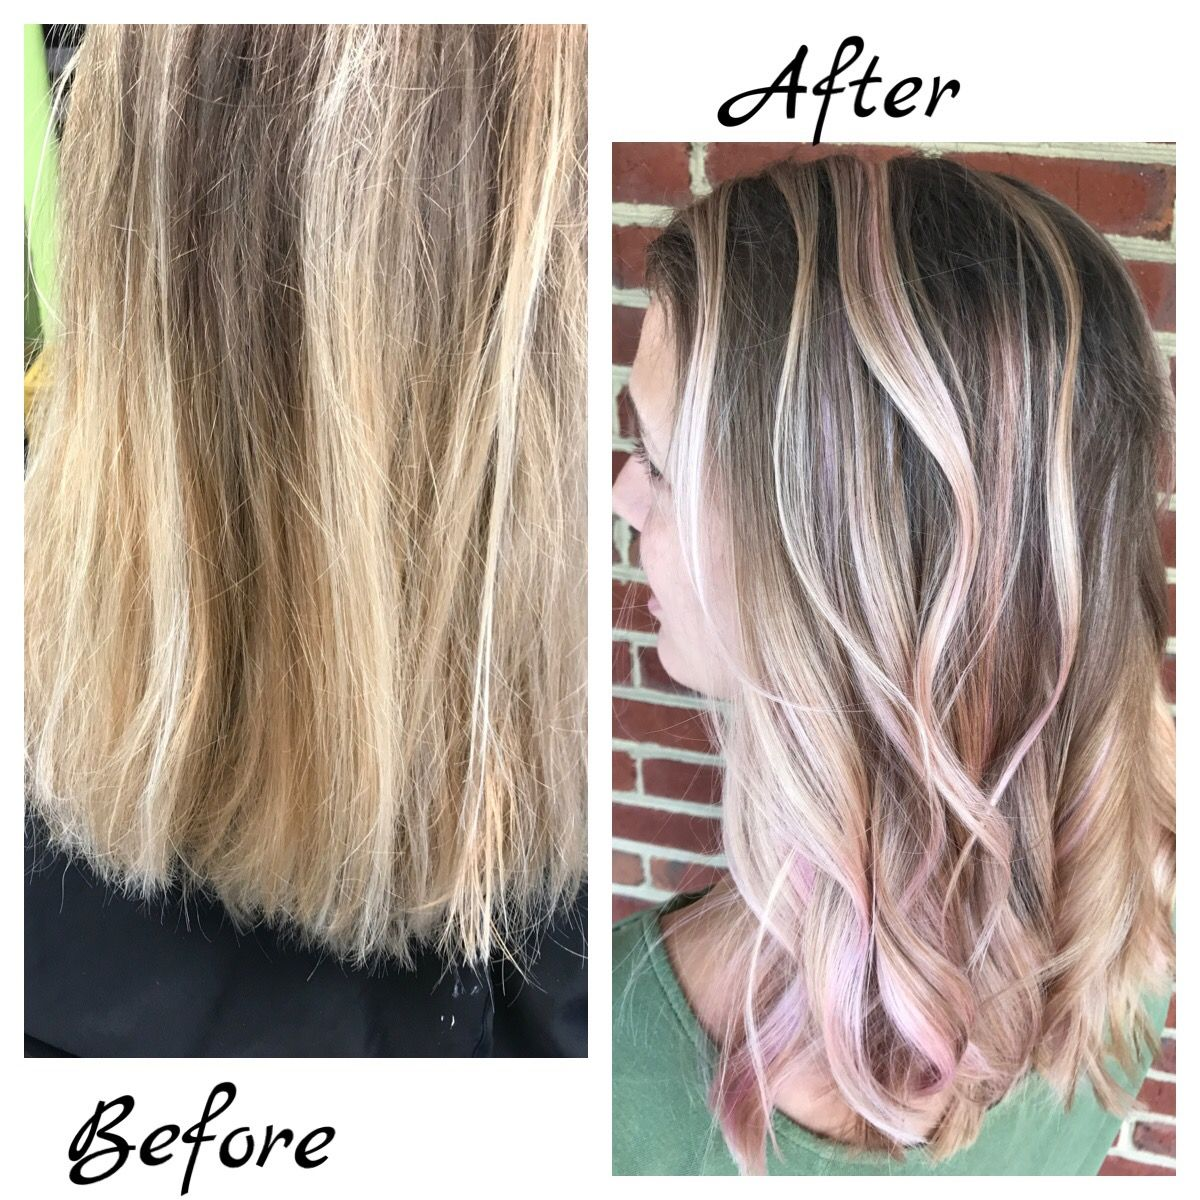 Hair By Nikki Beforeafter Tangledupsalonvb Hair Haircolor Rosegold Beauty Virginiabeachhair Haircut St Hair Powder Hair Styles Haircuts For Curly Hair